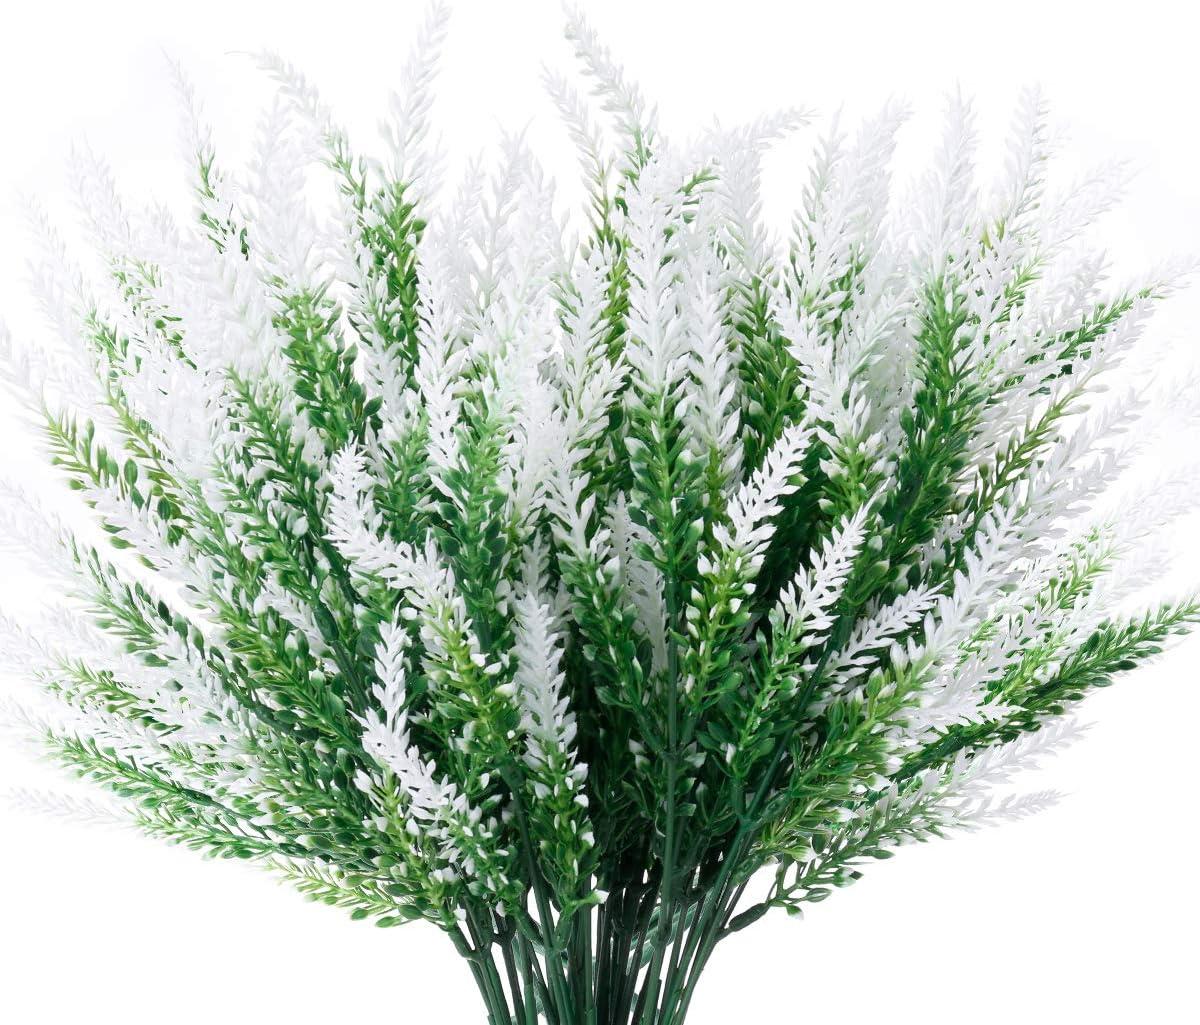 JEMONG 8 Bundles Artificial Lavender Flowers Outdoor UV Resistant Fake Flowers No Fade Faux Plastic Plants Garden Porch Window Box Decorating (Classic White)